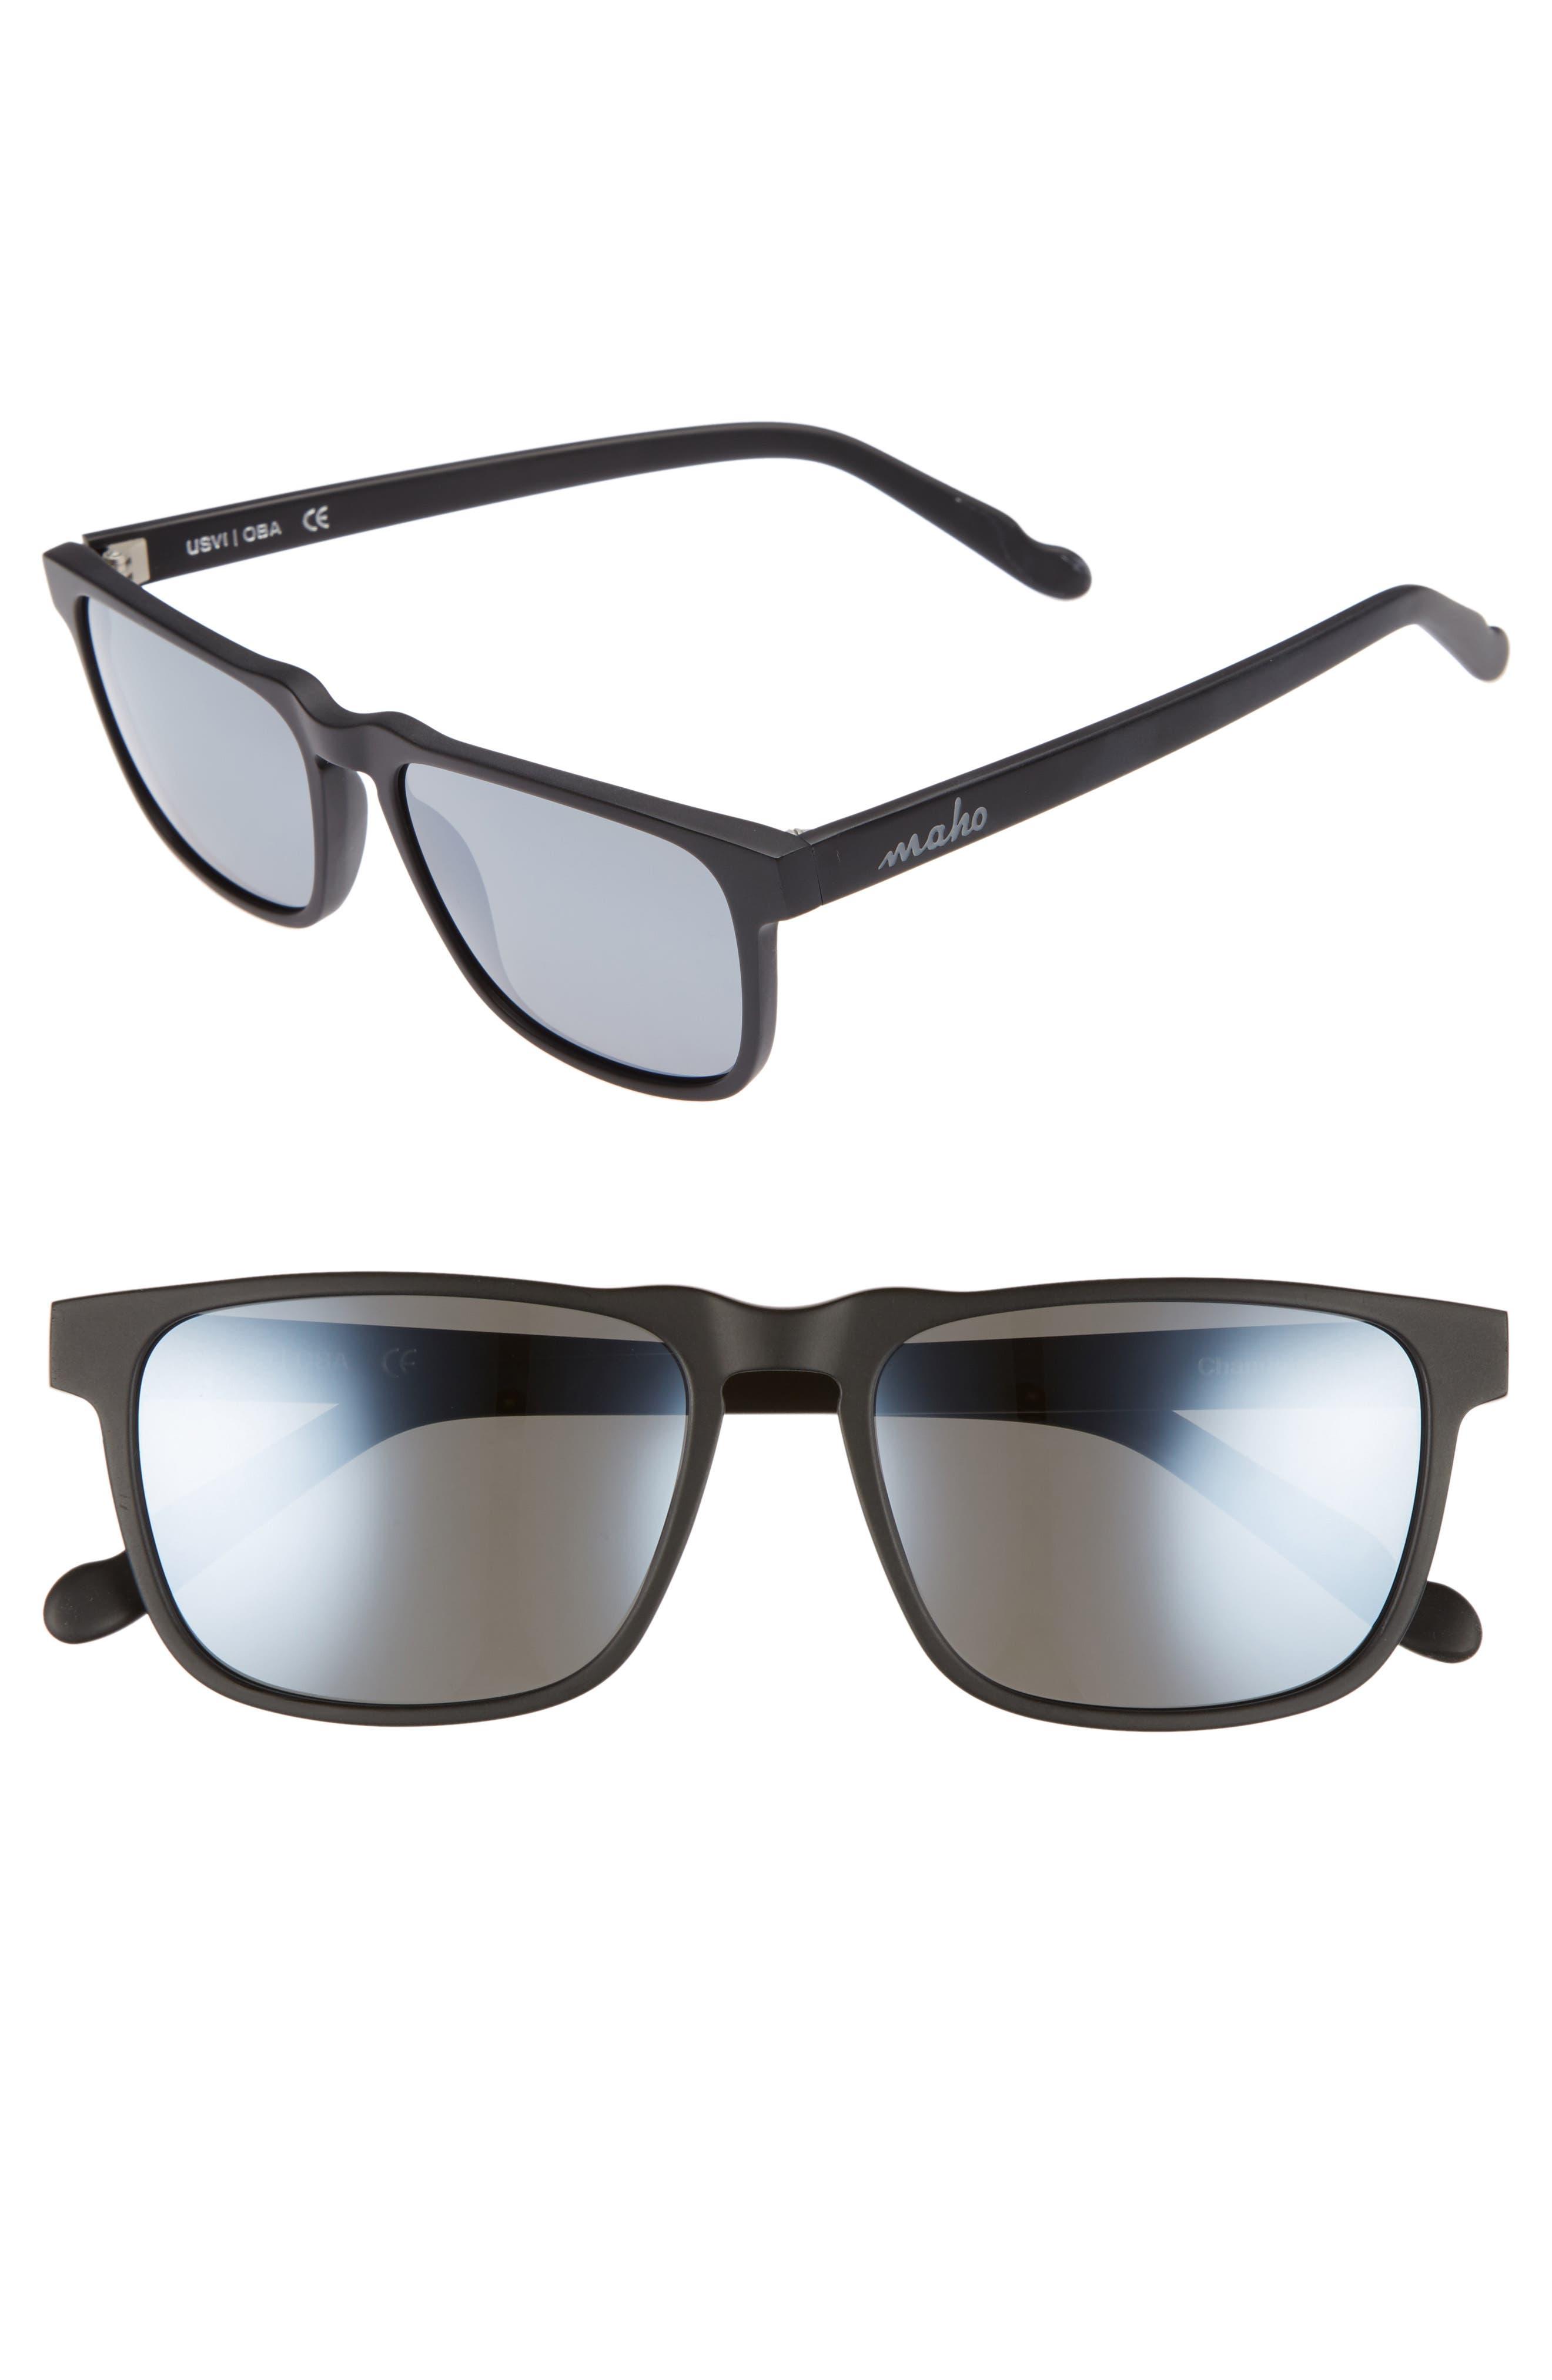 Chandeleur 59mm Polarized Aviator Sunglasses,                         Main,                         color, 020